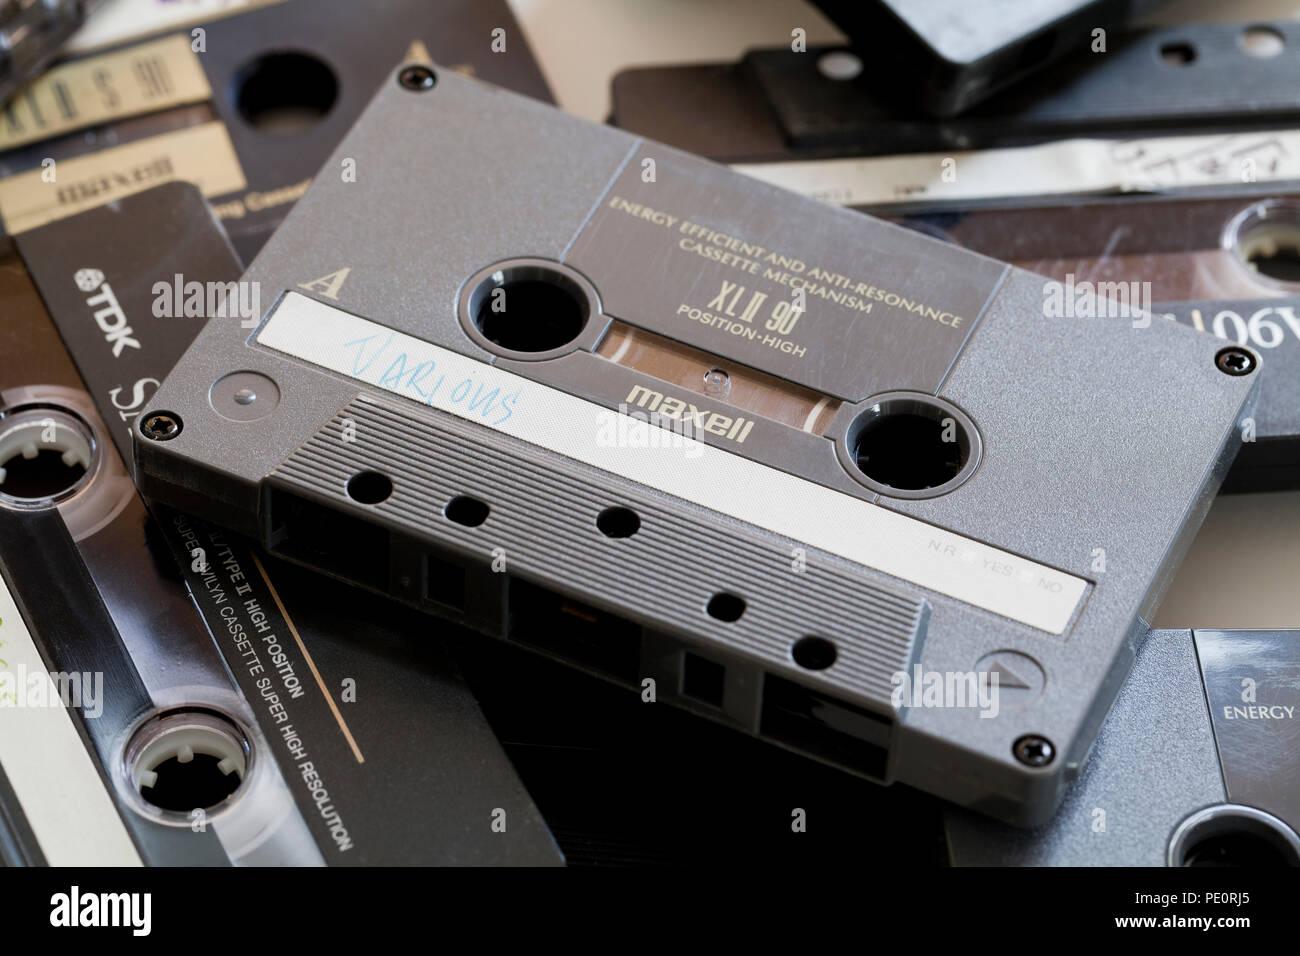 Compact audio cassette tape (aka compact cassette, music cassette) - USA - Stock Image